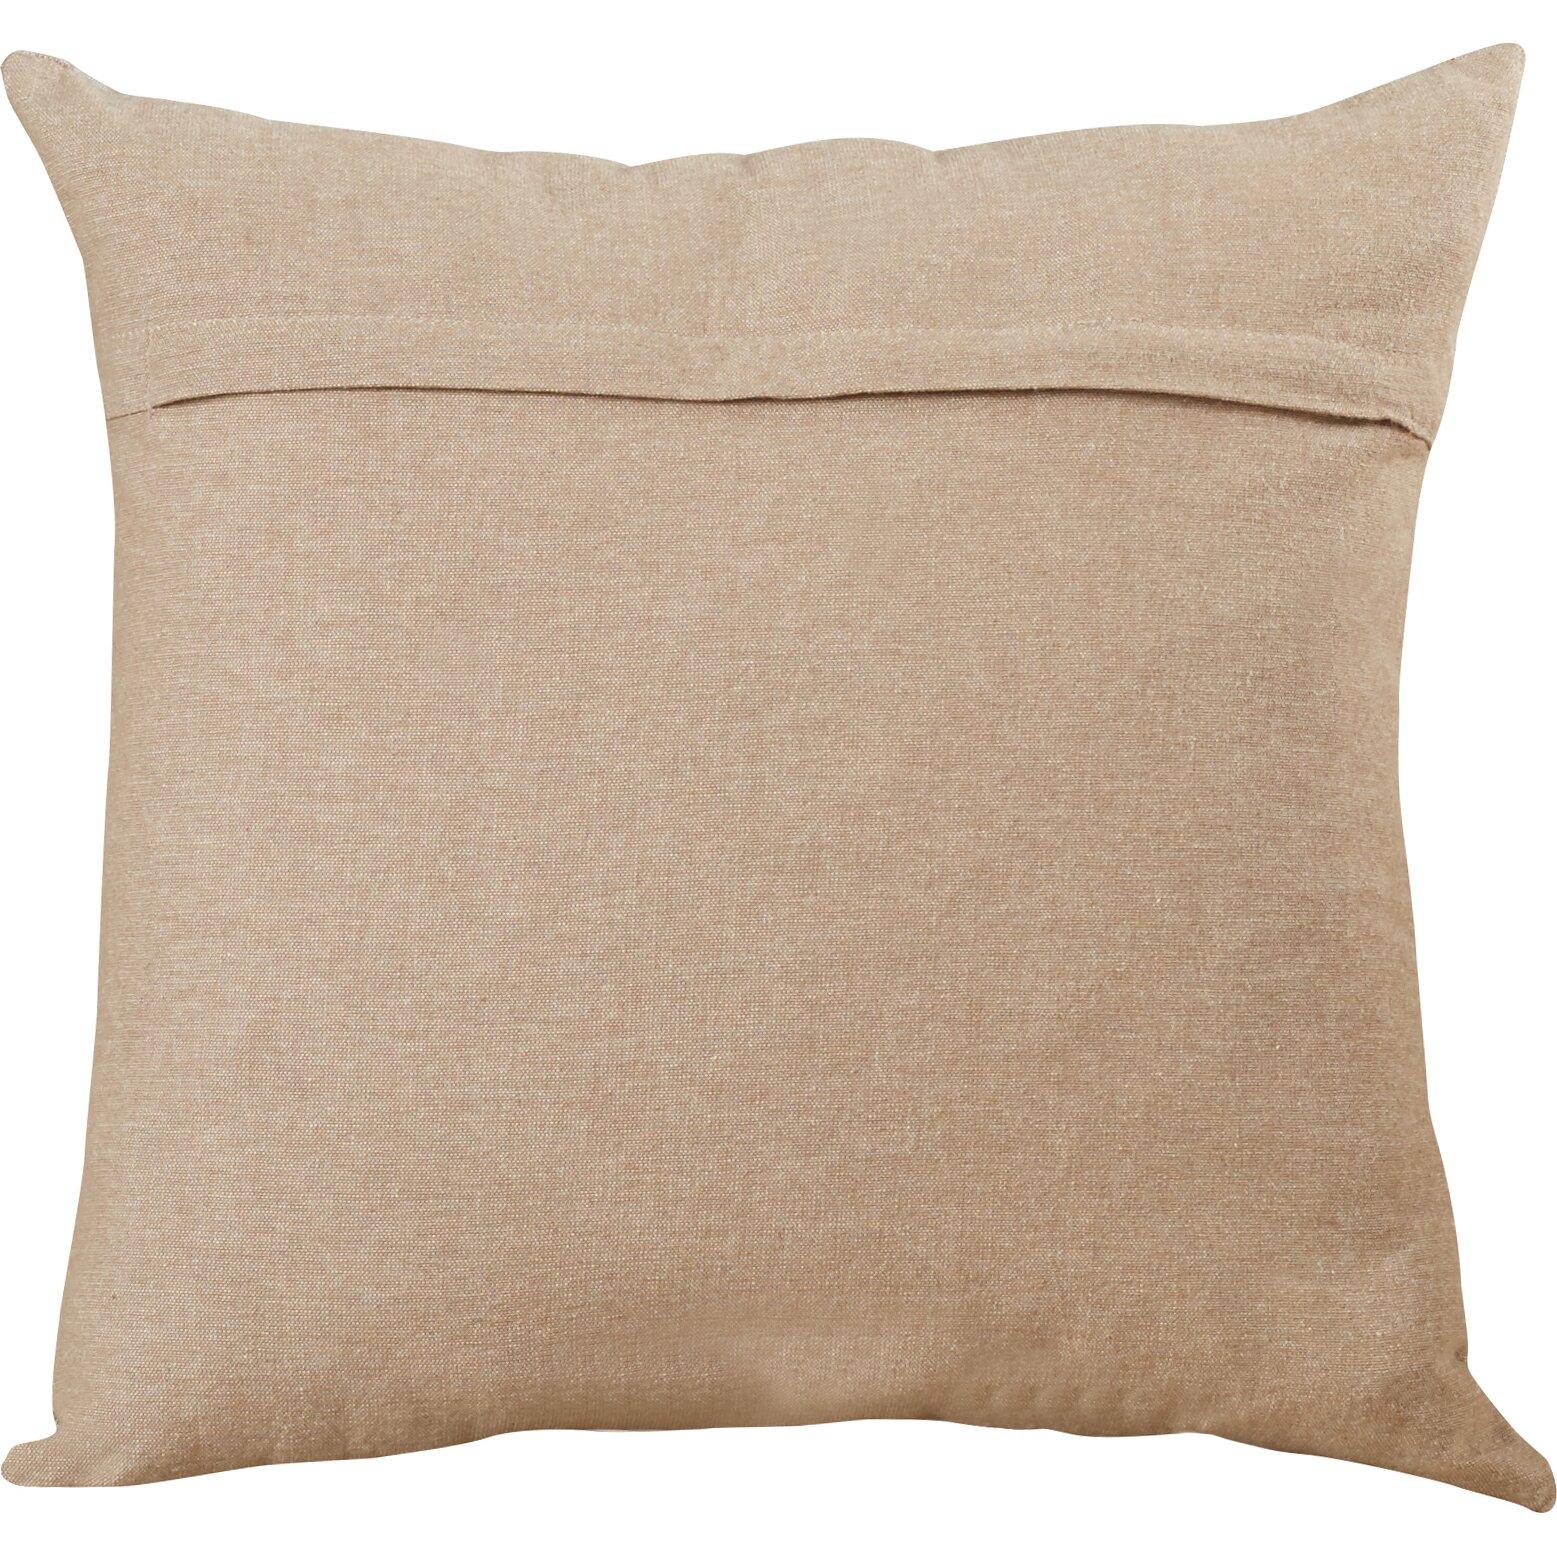 House of hampton corin down throw pillow reviews wayfair for Buy hampton inn pillows